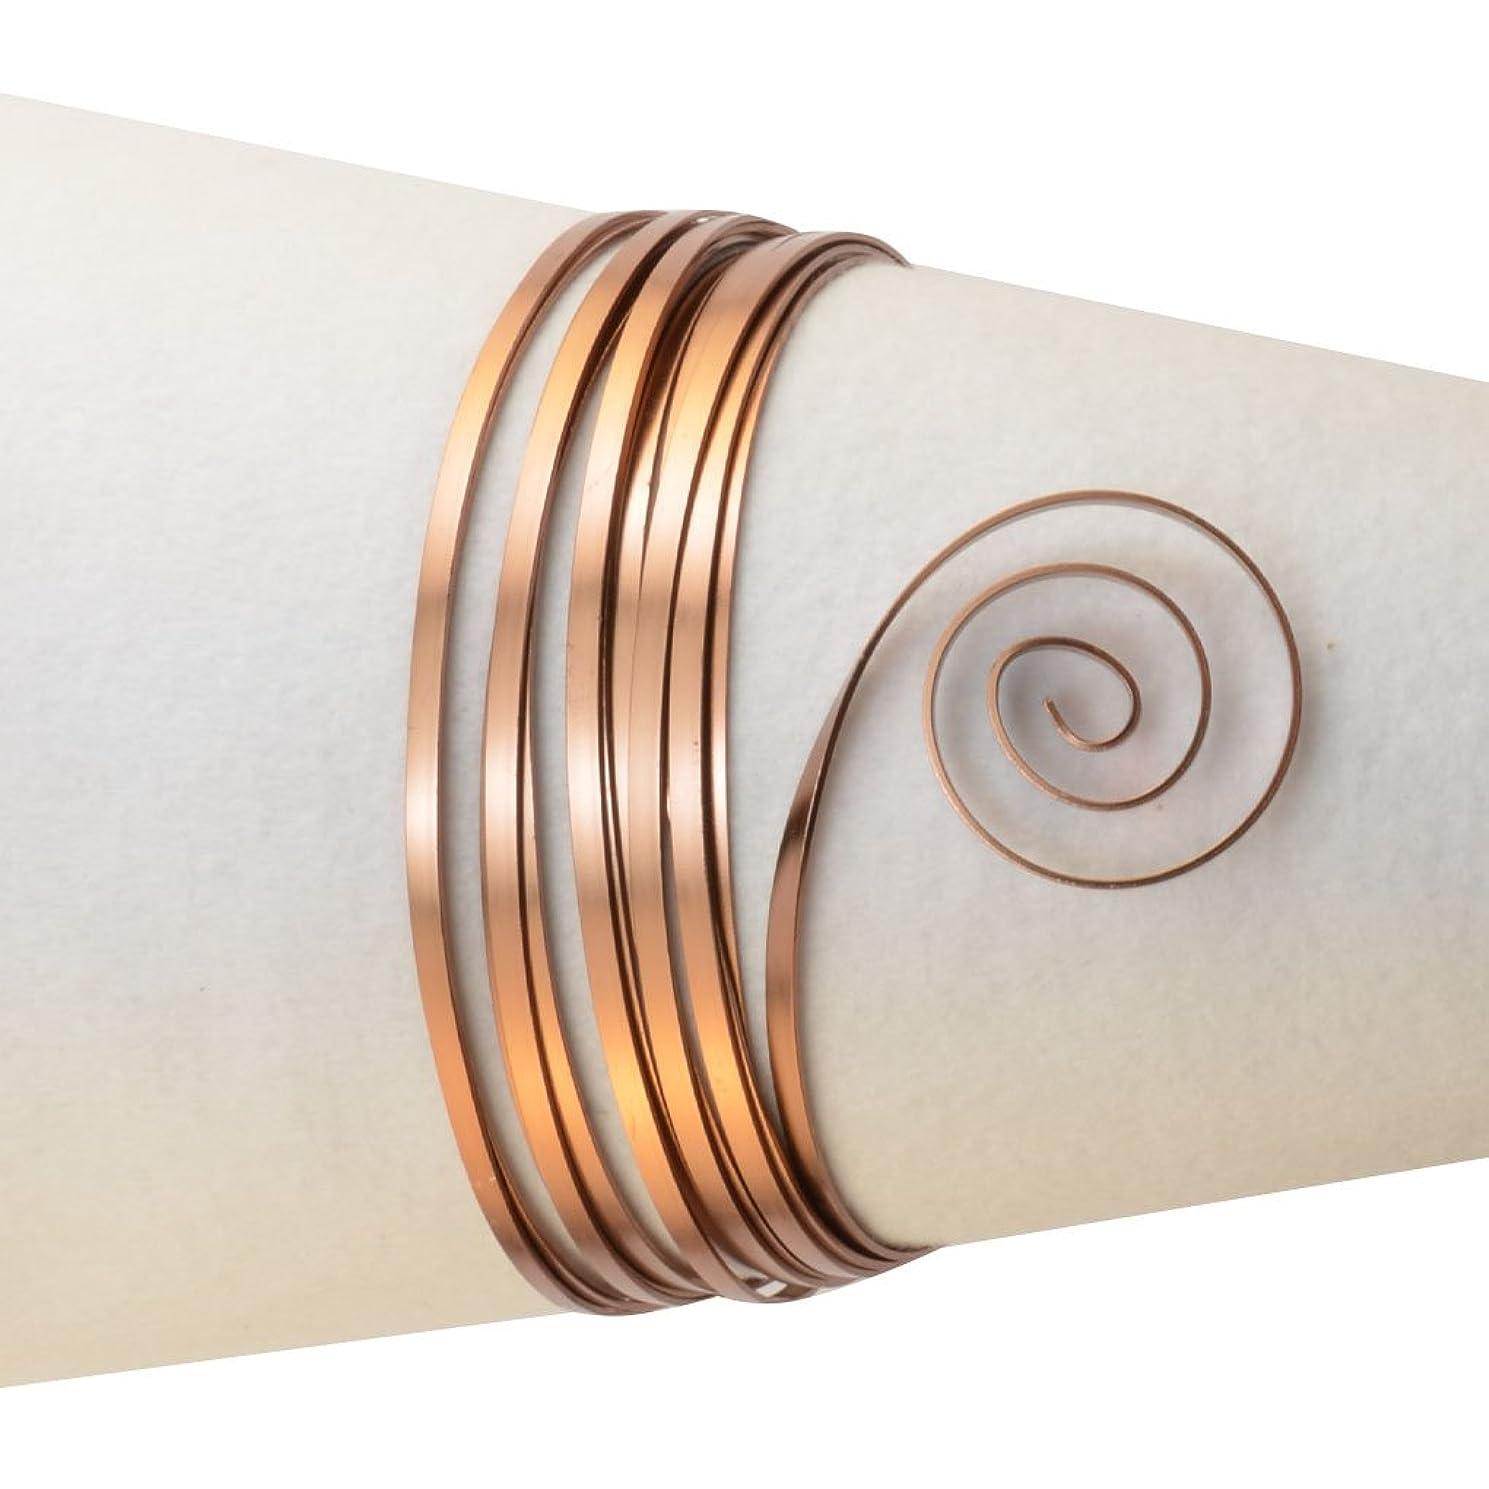 Vaessen Creative Aluminium Flat Wire 5x1mm 5m Brown,